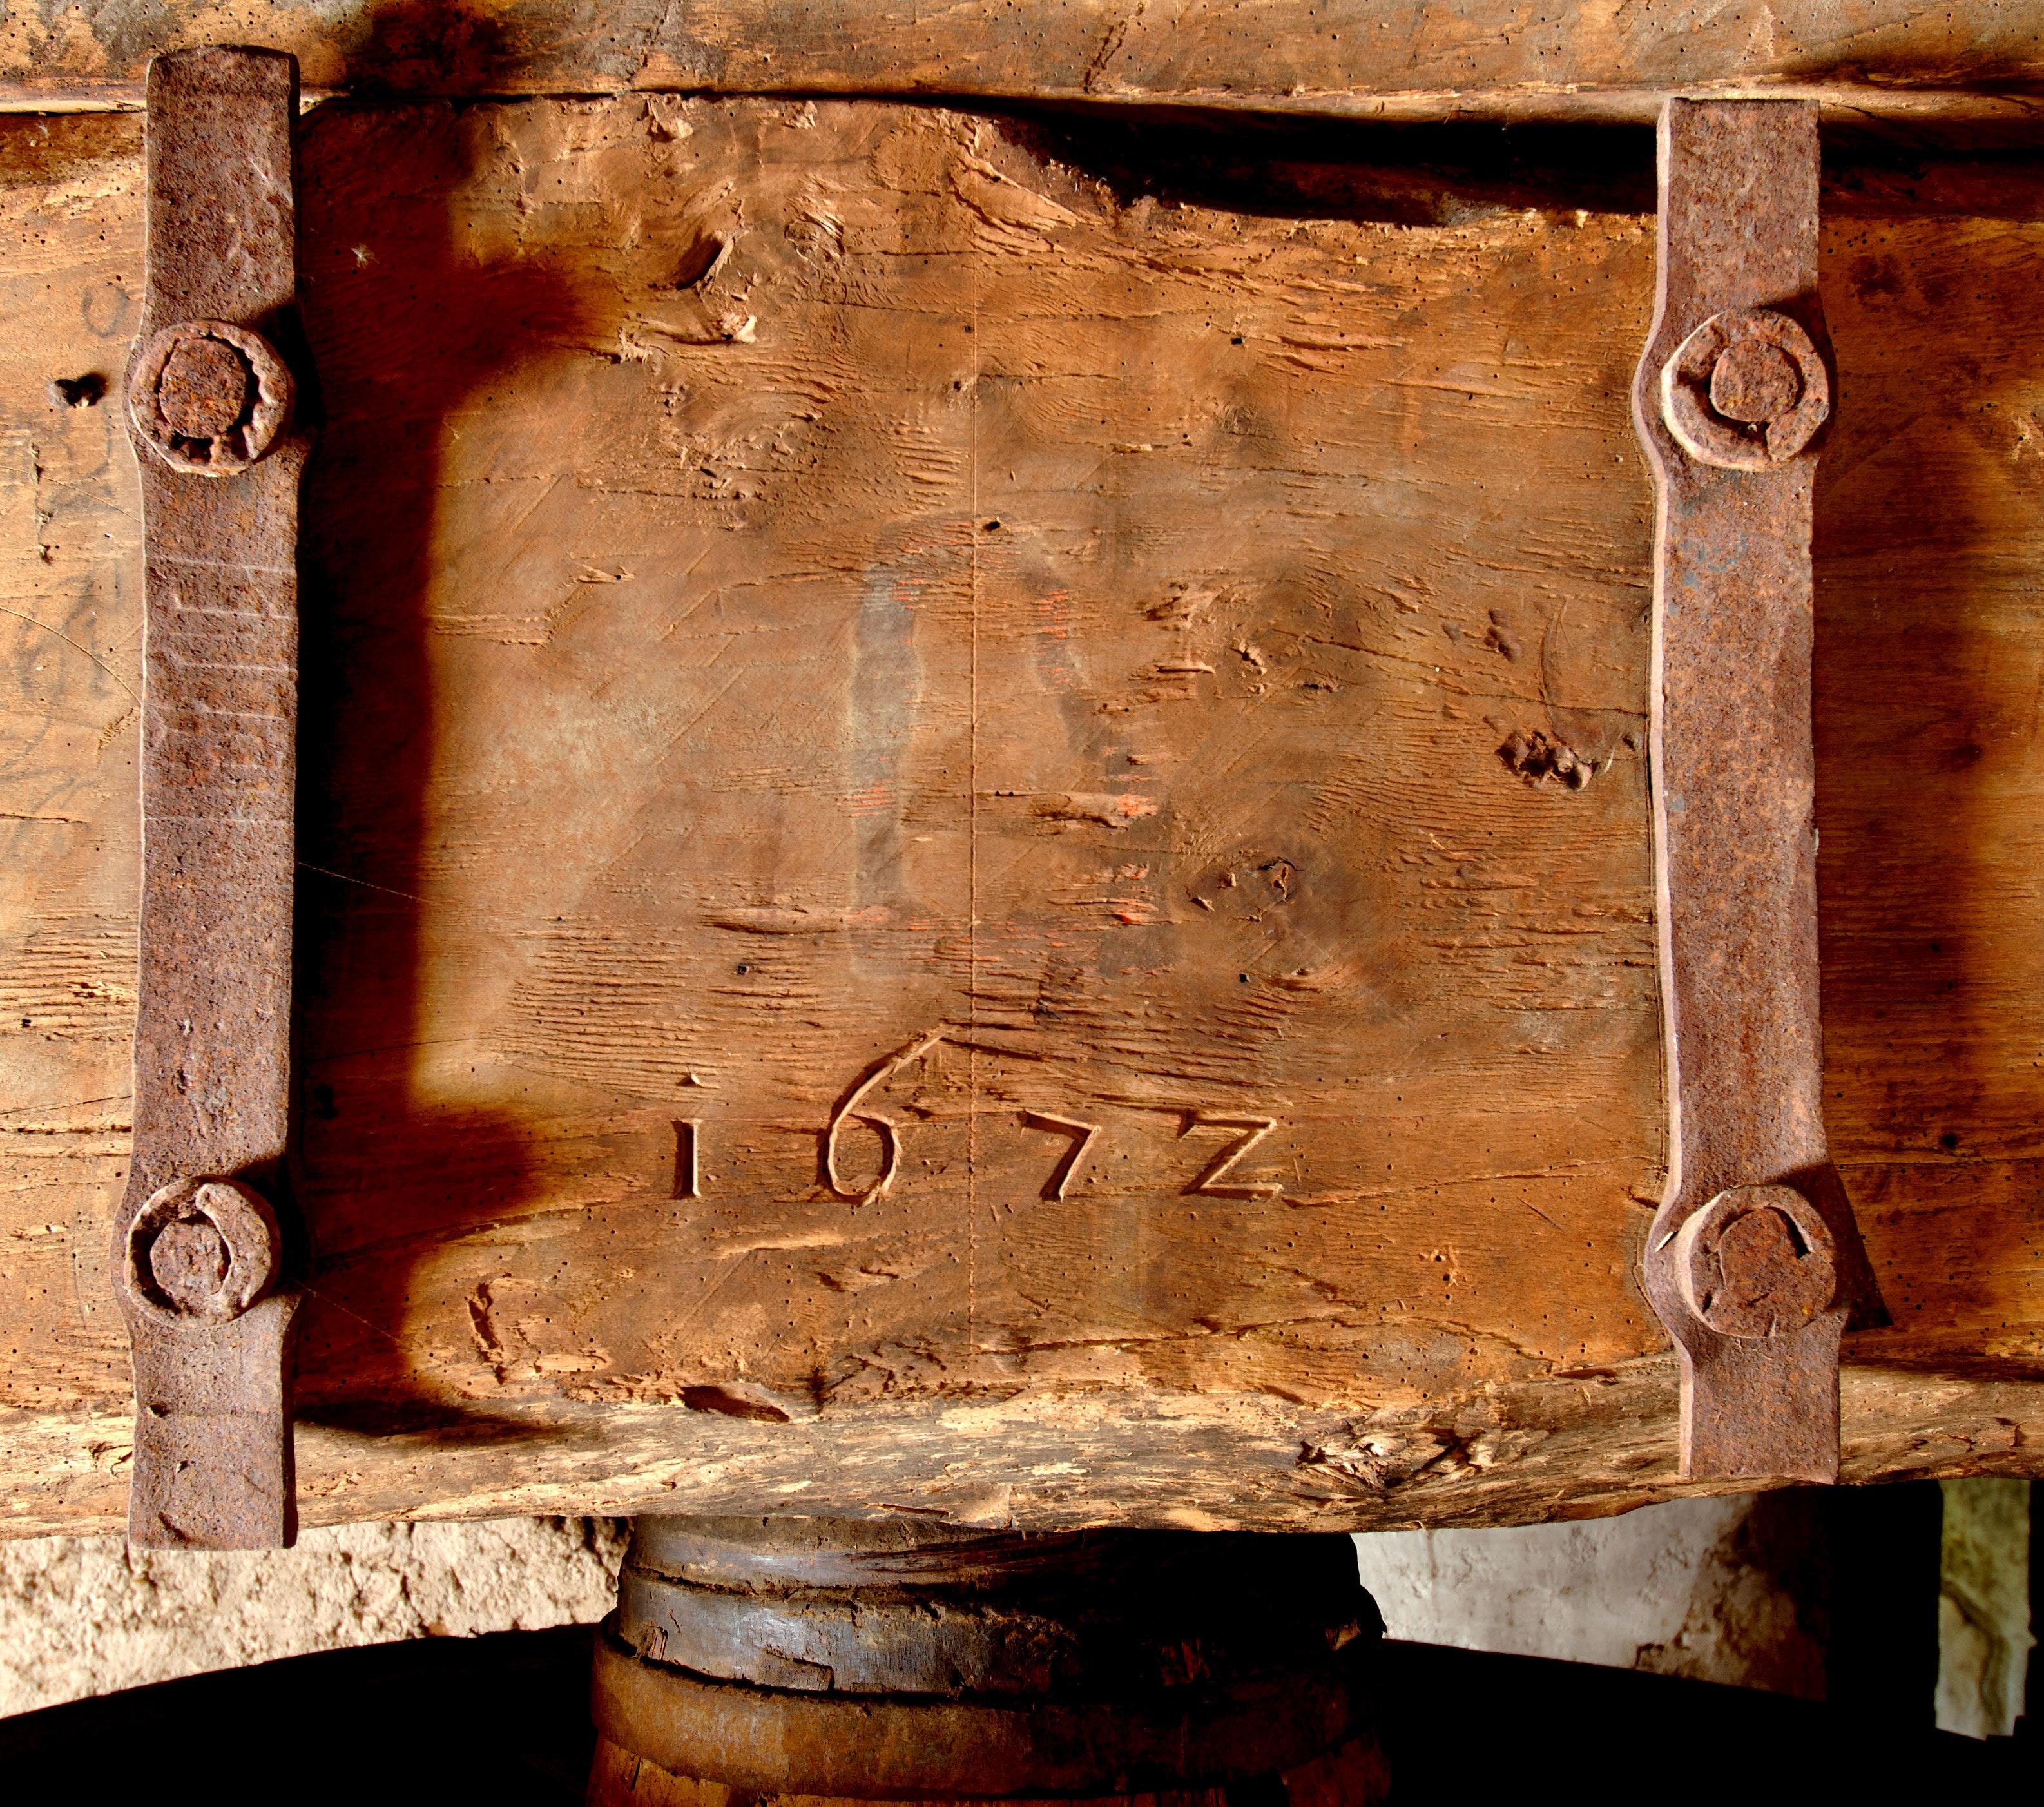 1672, MULINO MAURIZIO GERVASONI, RONCOBELLO (BG )